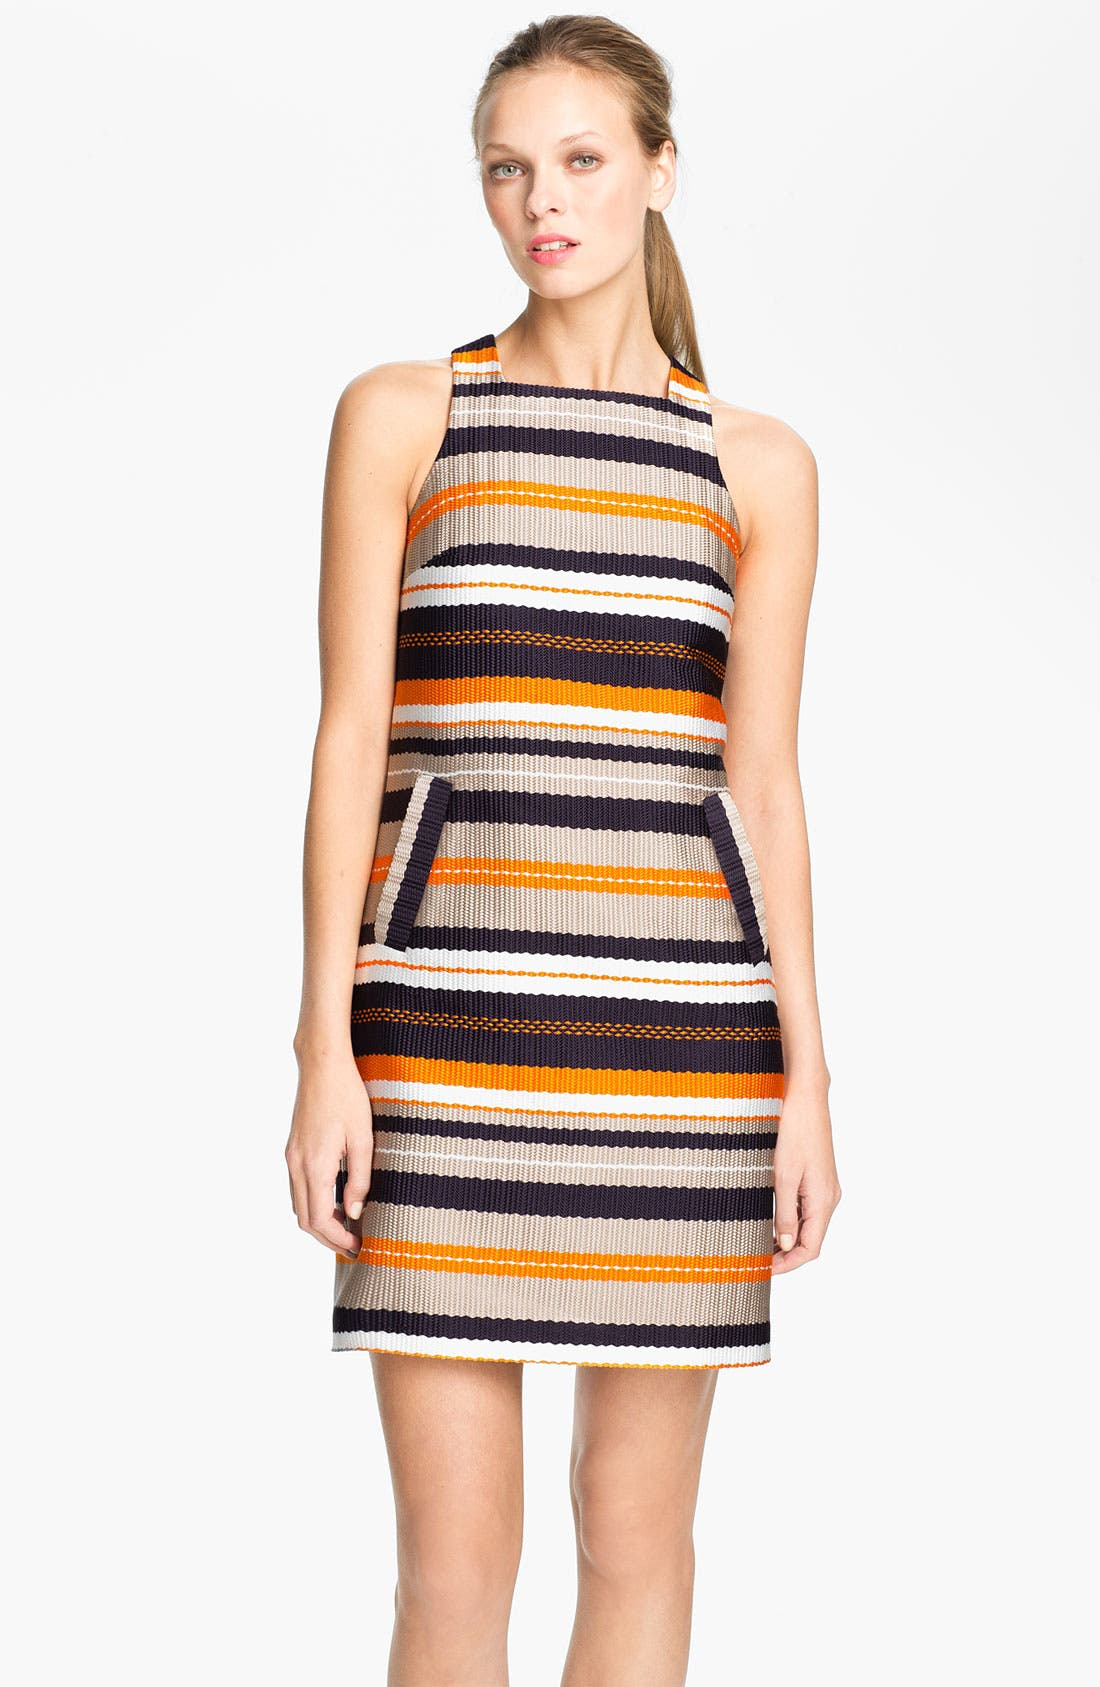 Alternate Image 1 Selected - Trina Turk 'Spiegler' Woven Shift Dress